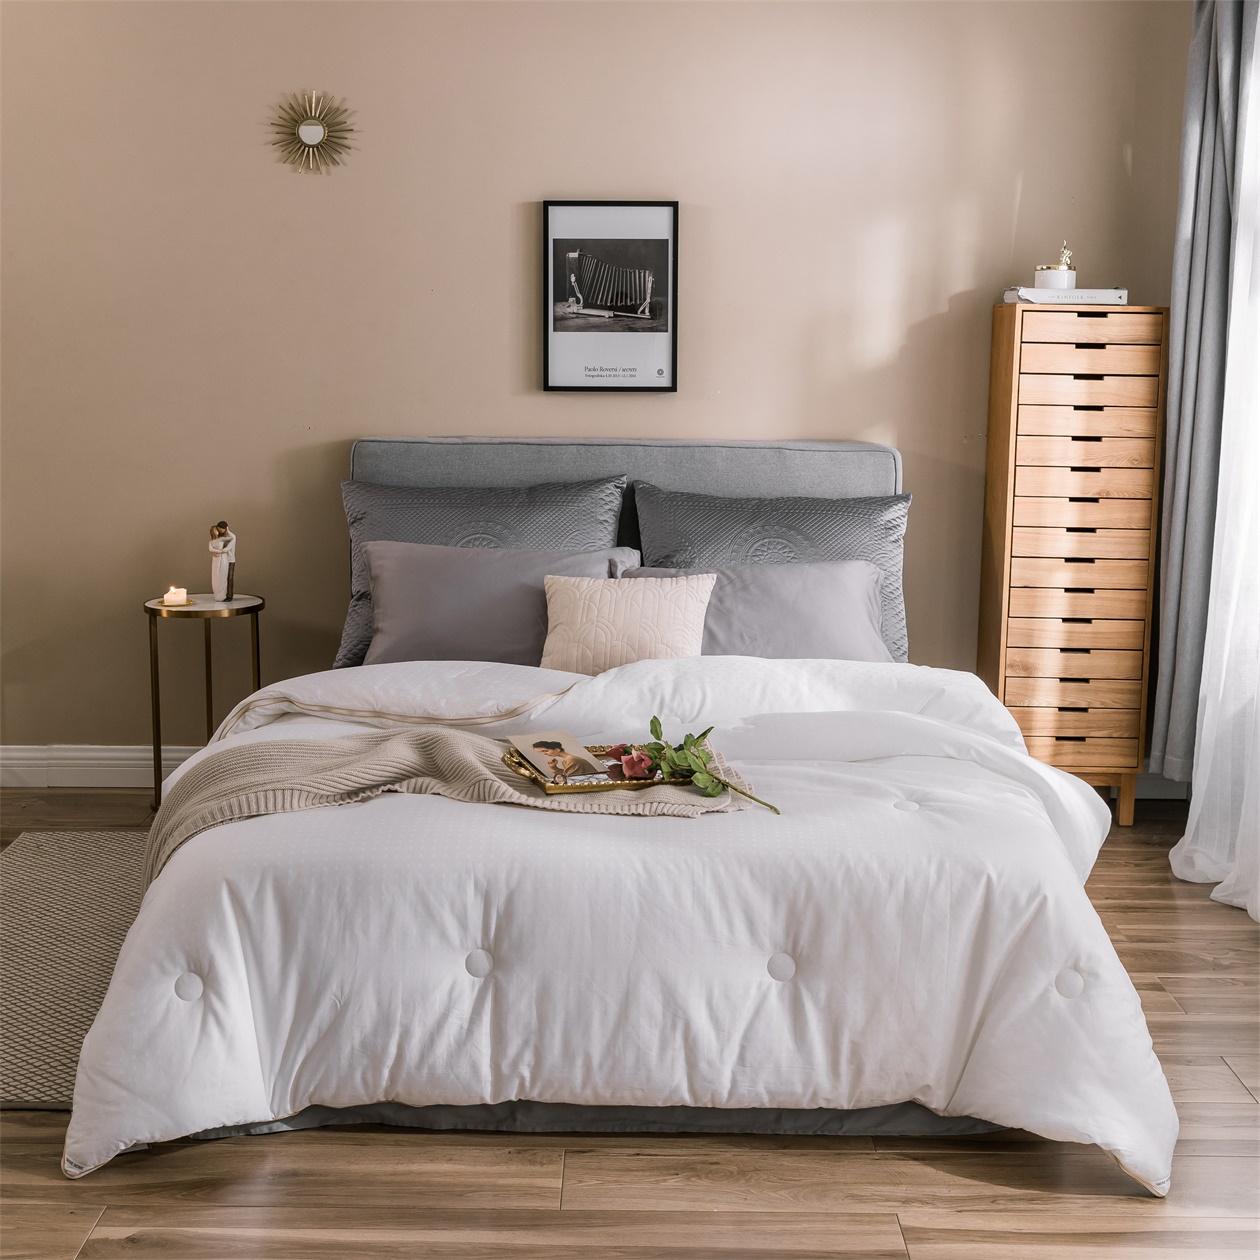 Шелковые одеяла / Одеяла Артикул 615254653983